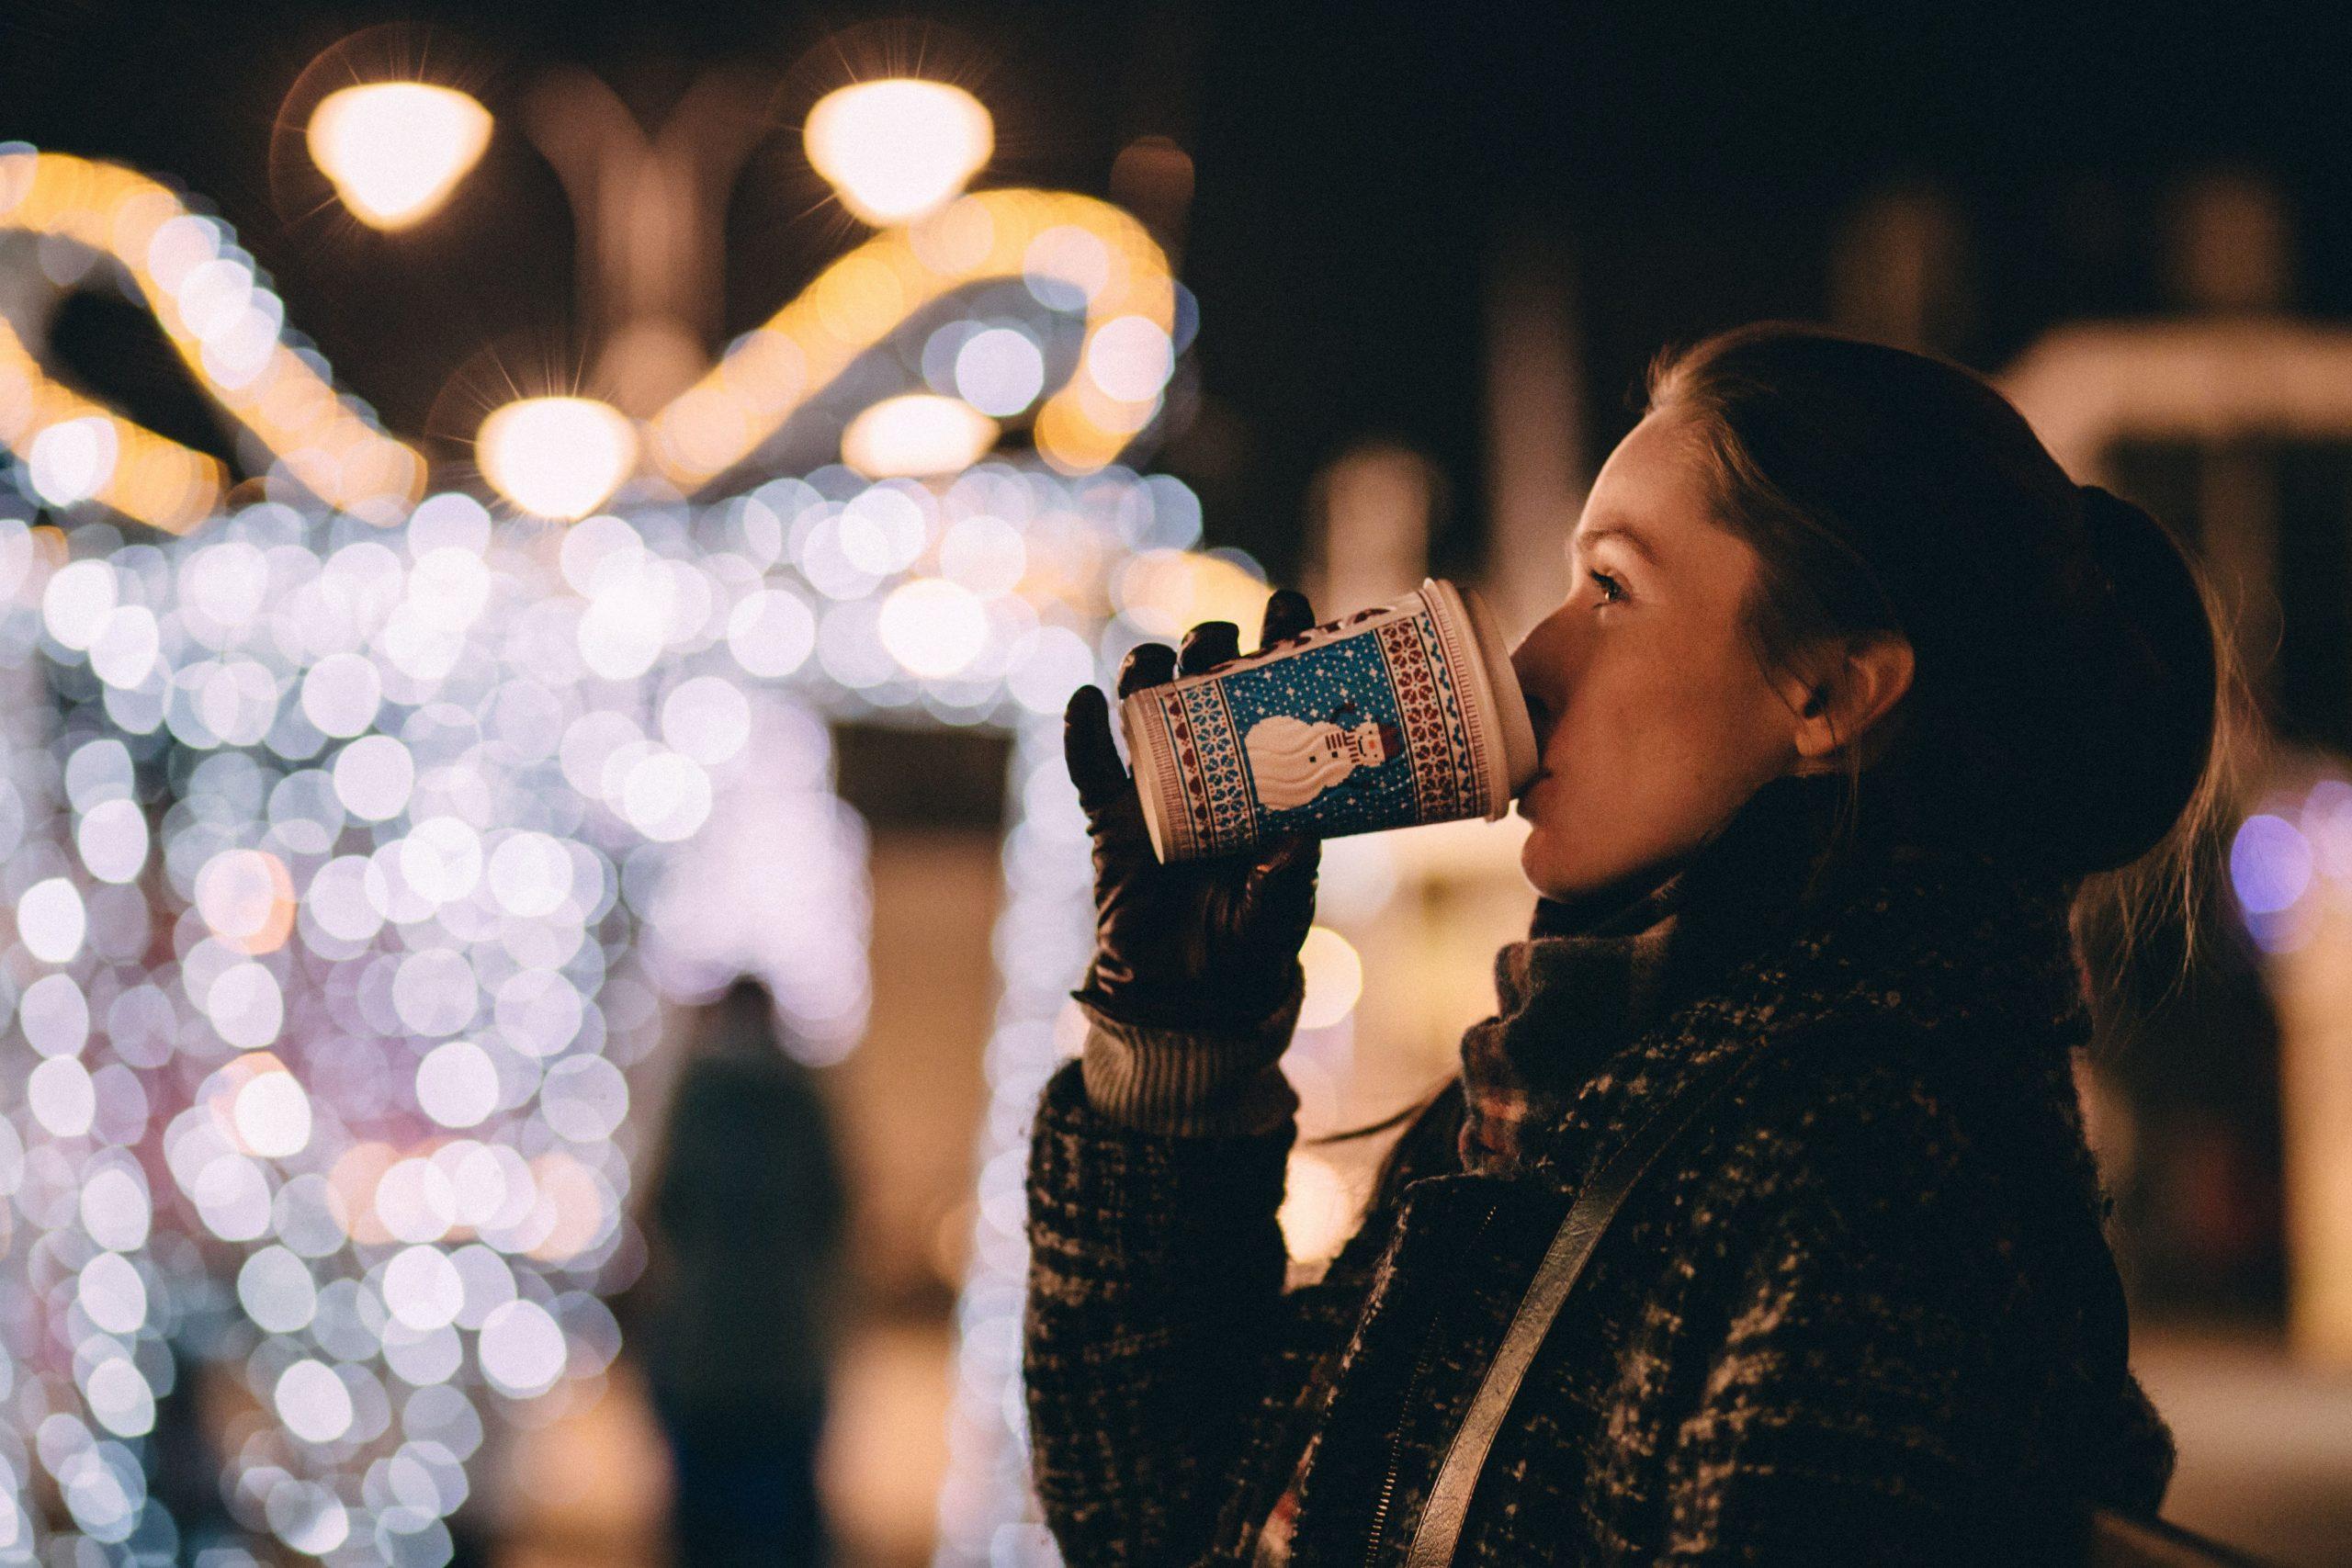 Woman enjoys hot beverage while looking at holiday lights